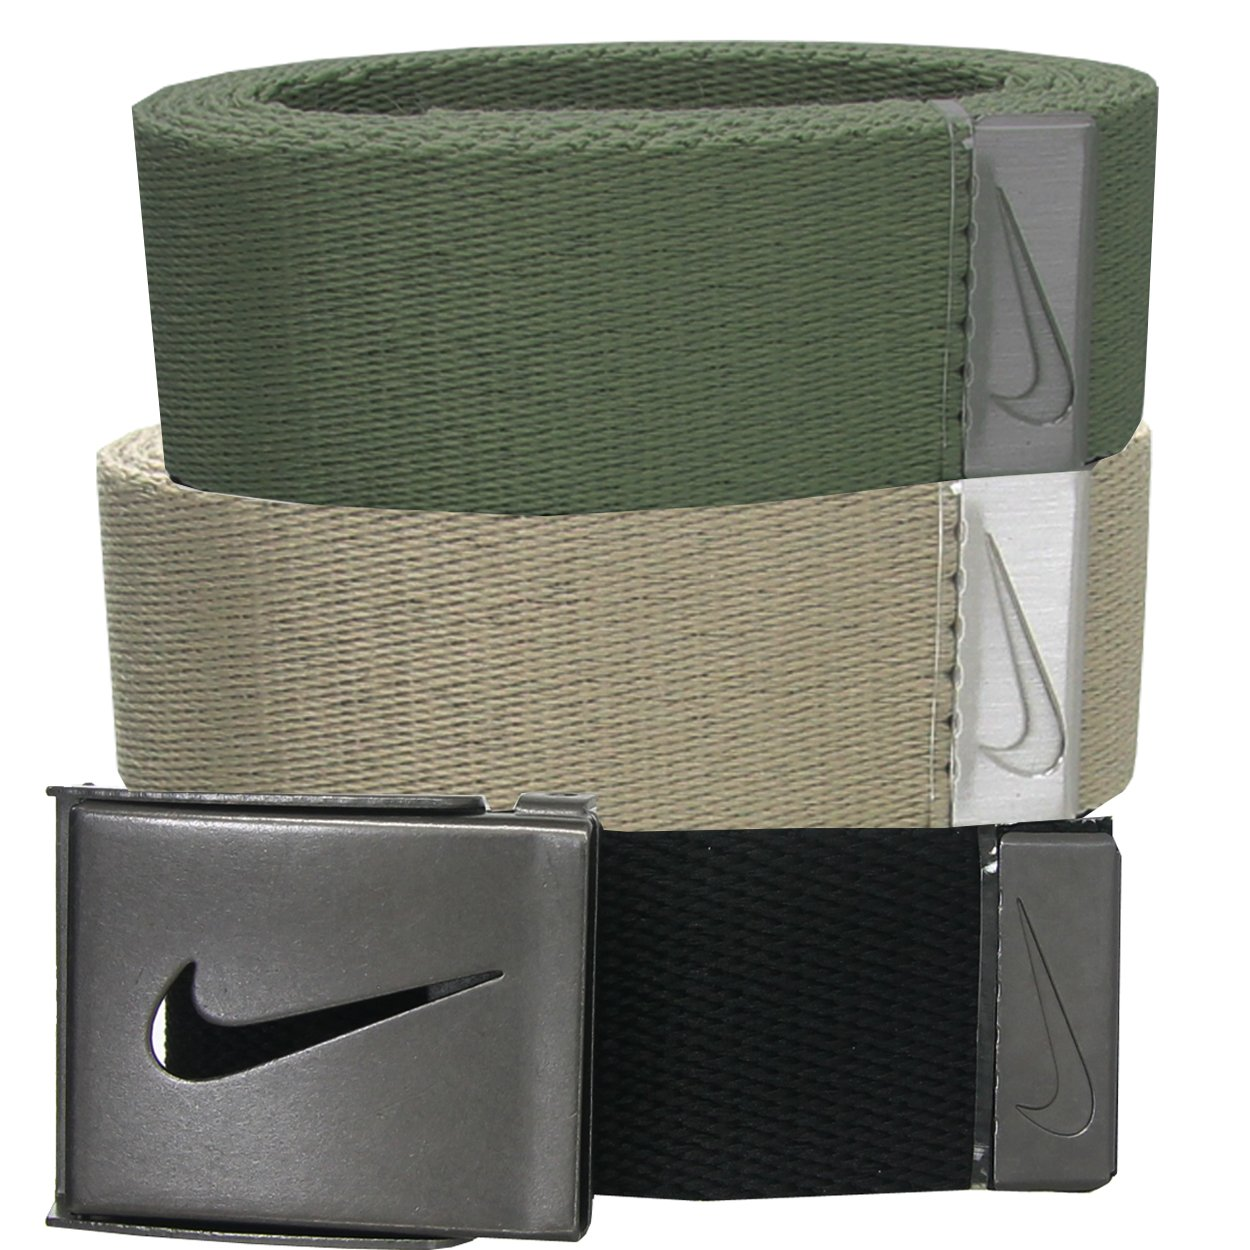 Nike Men's 3 Pack Web Belt, Black/Cargo Khaki, One Size